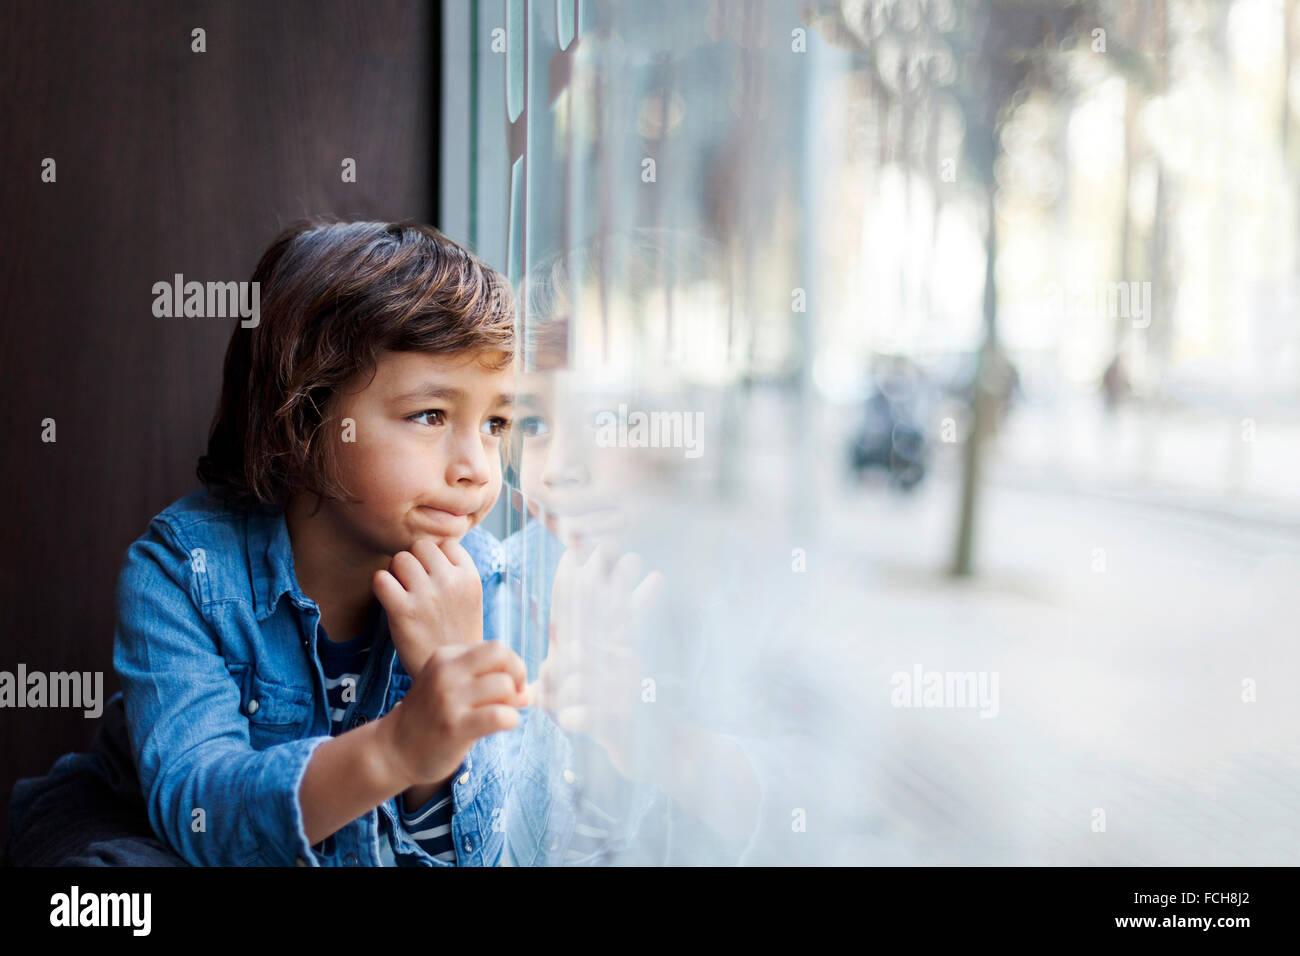 Portrait of little boy looking through window display - Stock Image